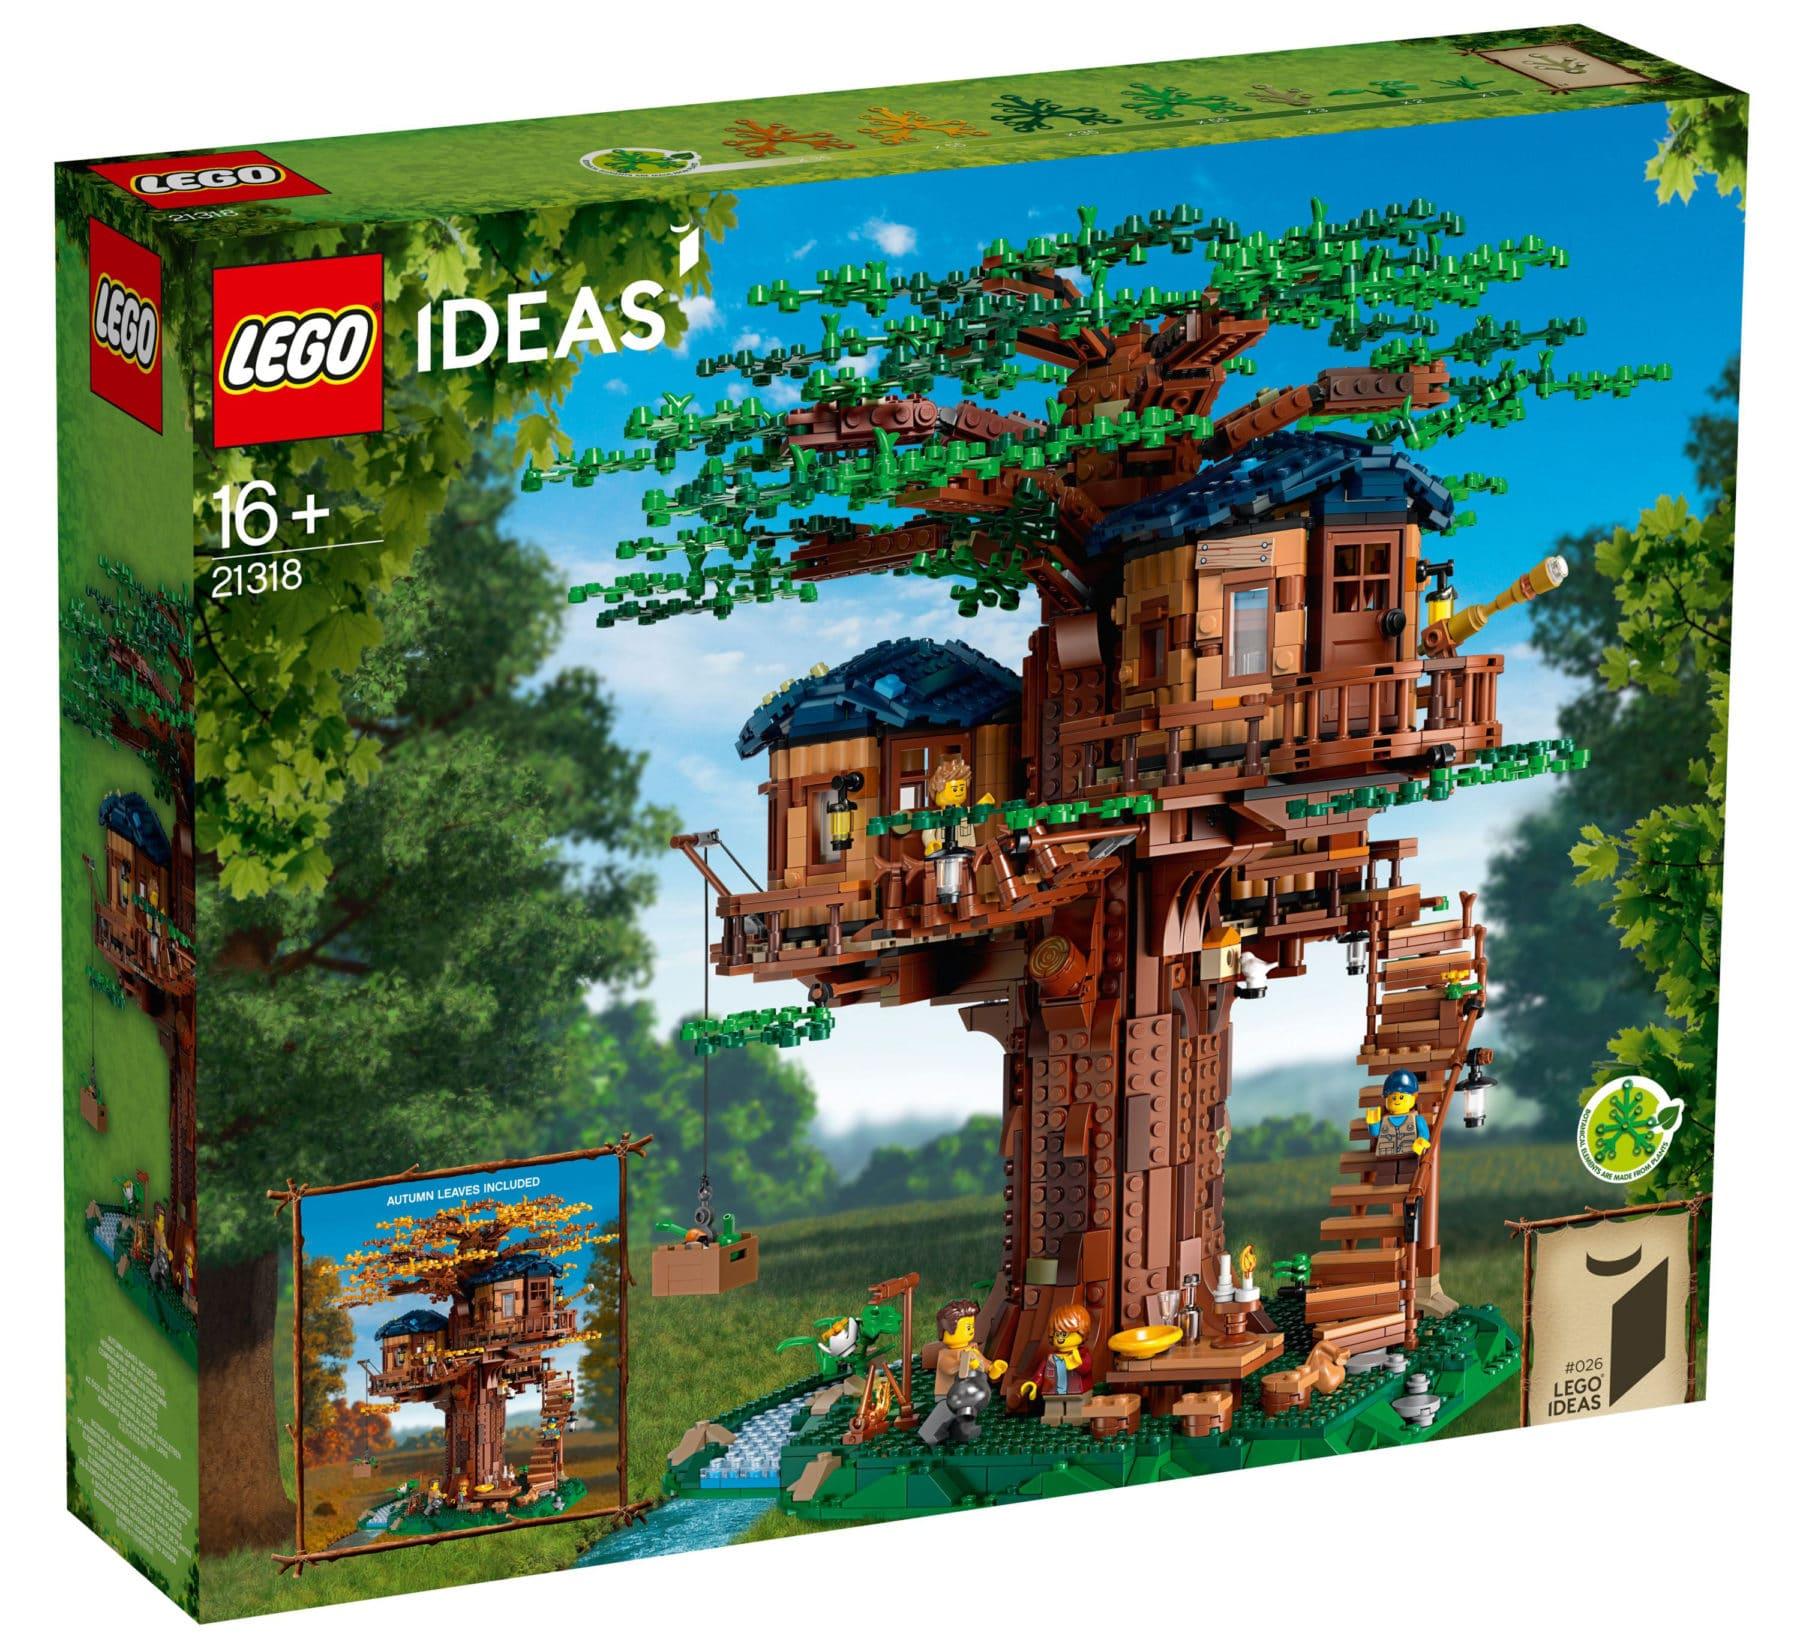 LEGO 21318 Baumhaus Box